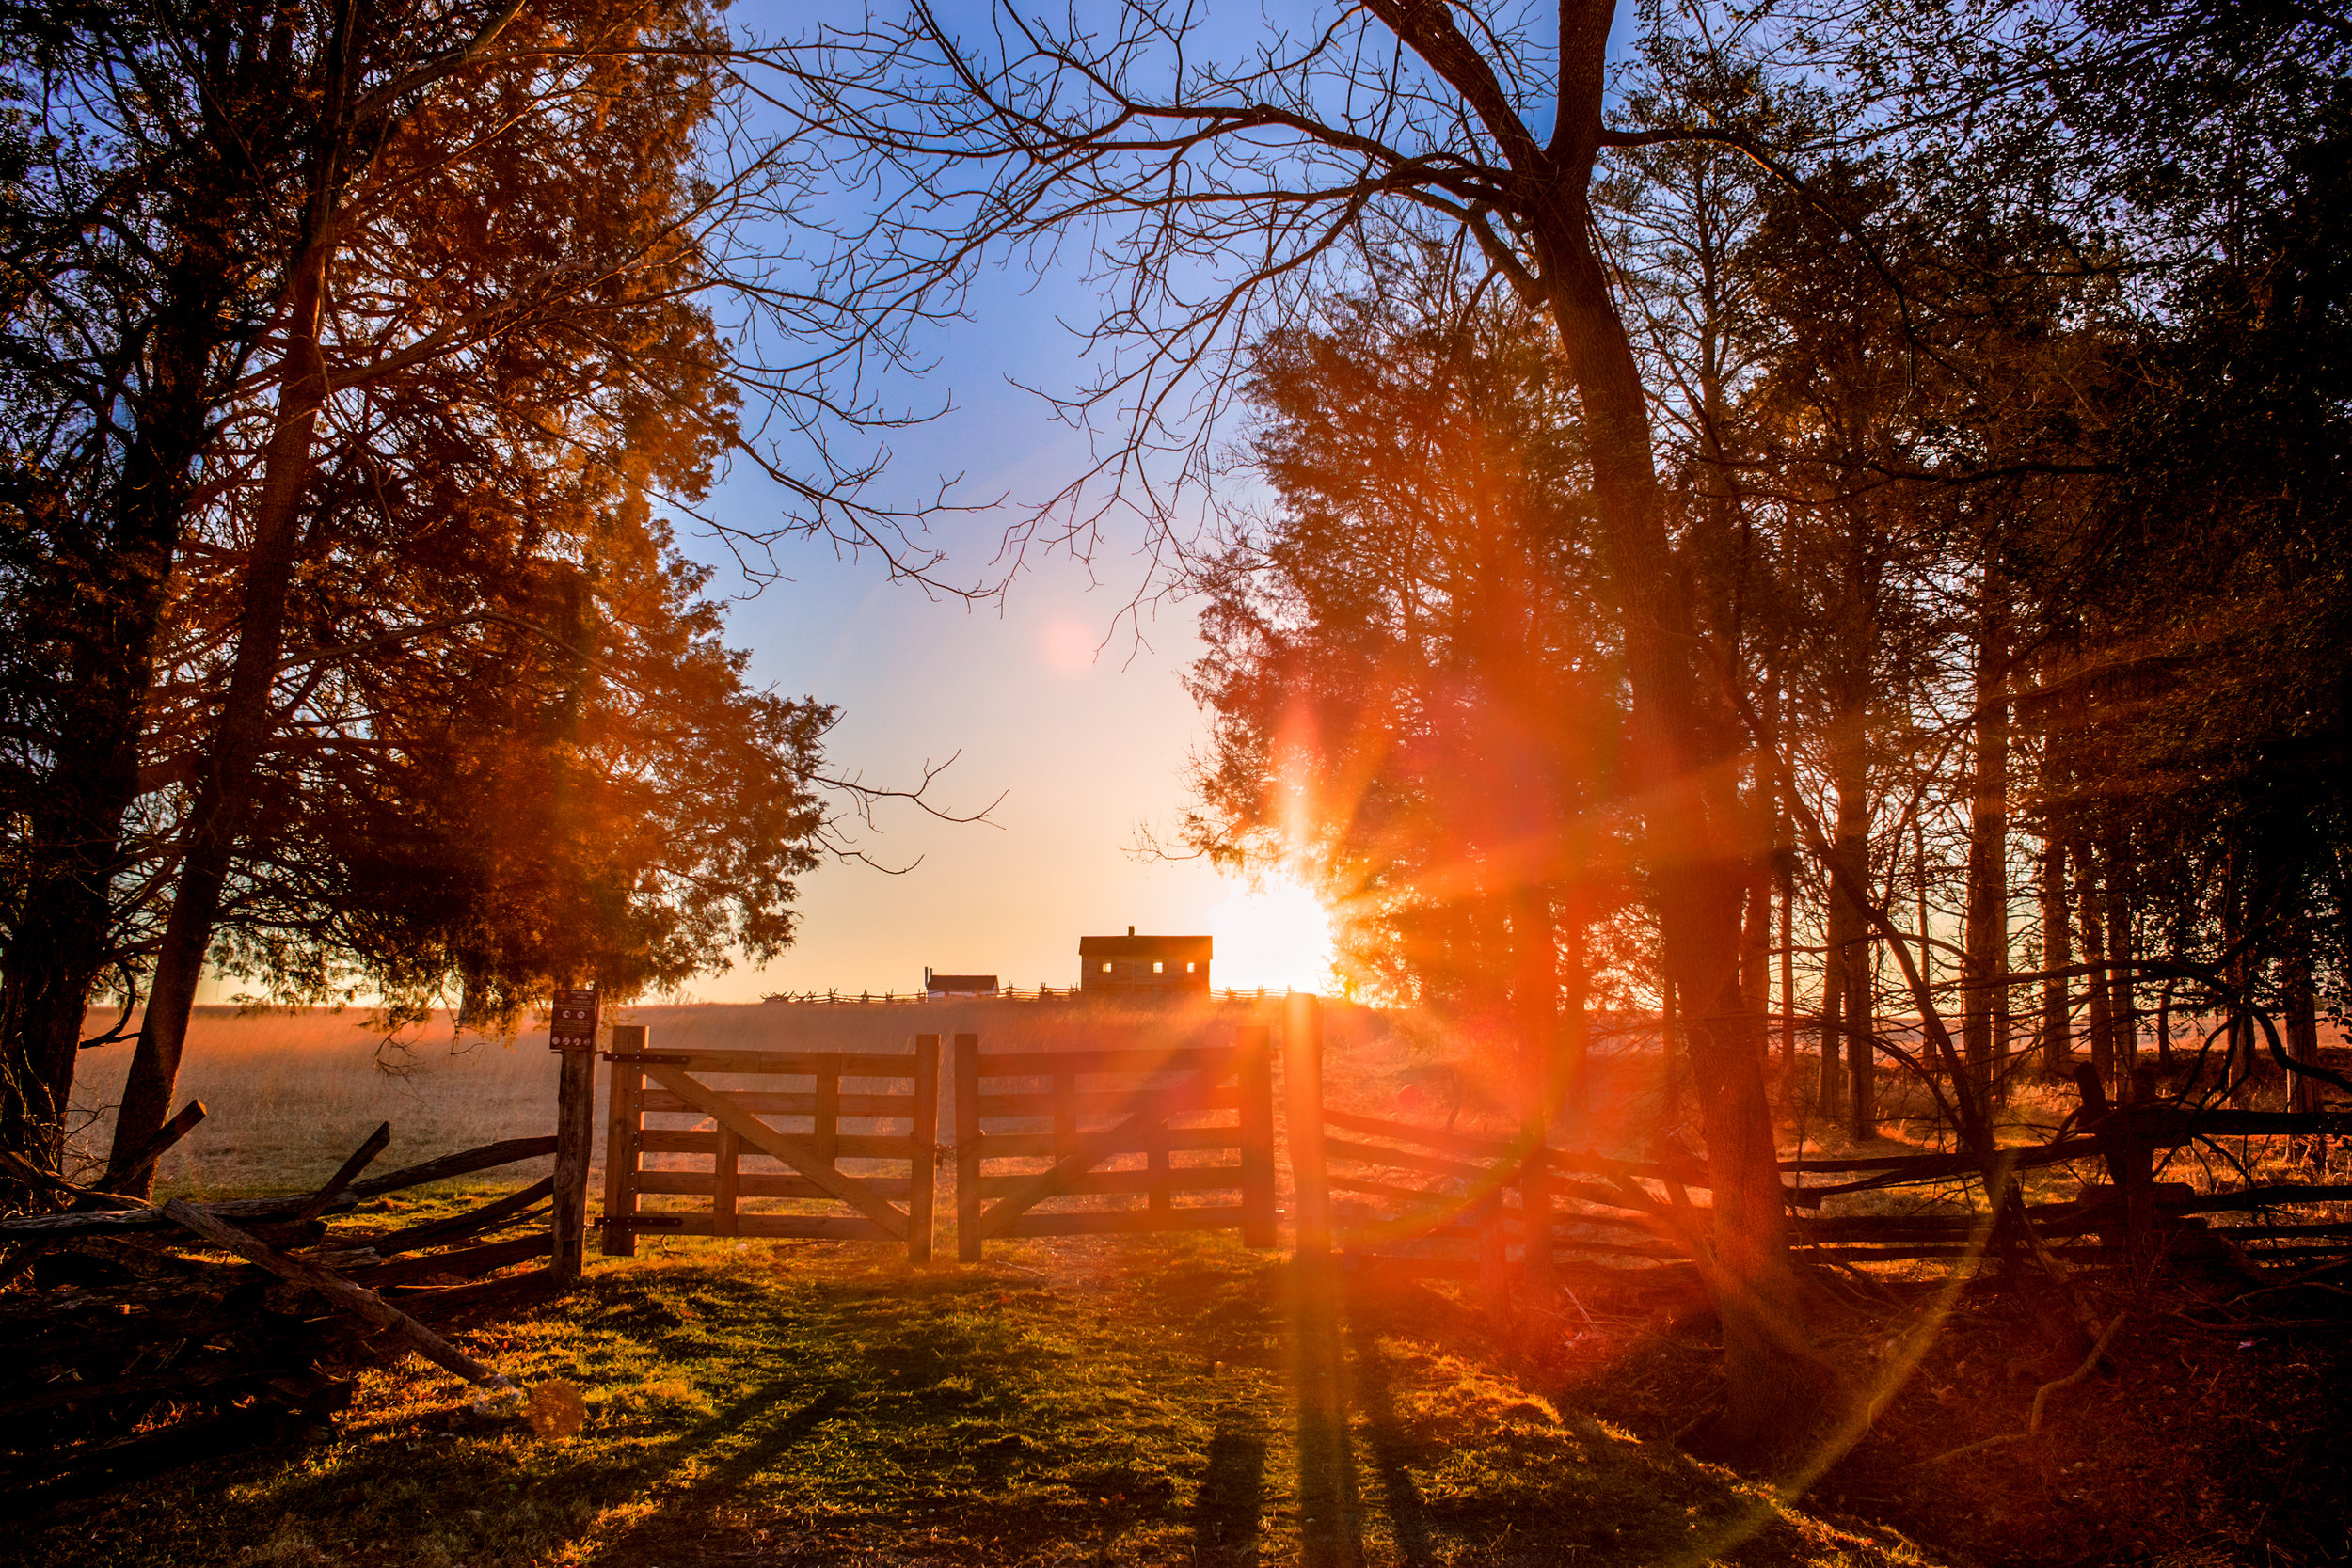 Sunrise at Manassas Battlefield Park | Manassas, Virginia | 2015 | Client: Flonase | © Christy Hydeck